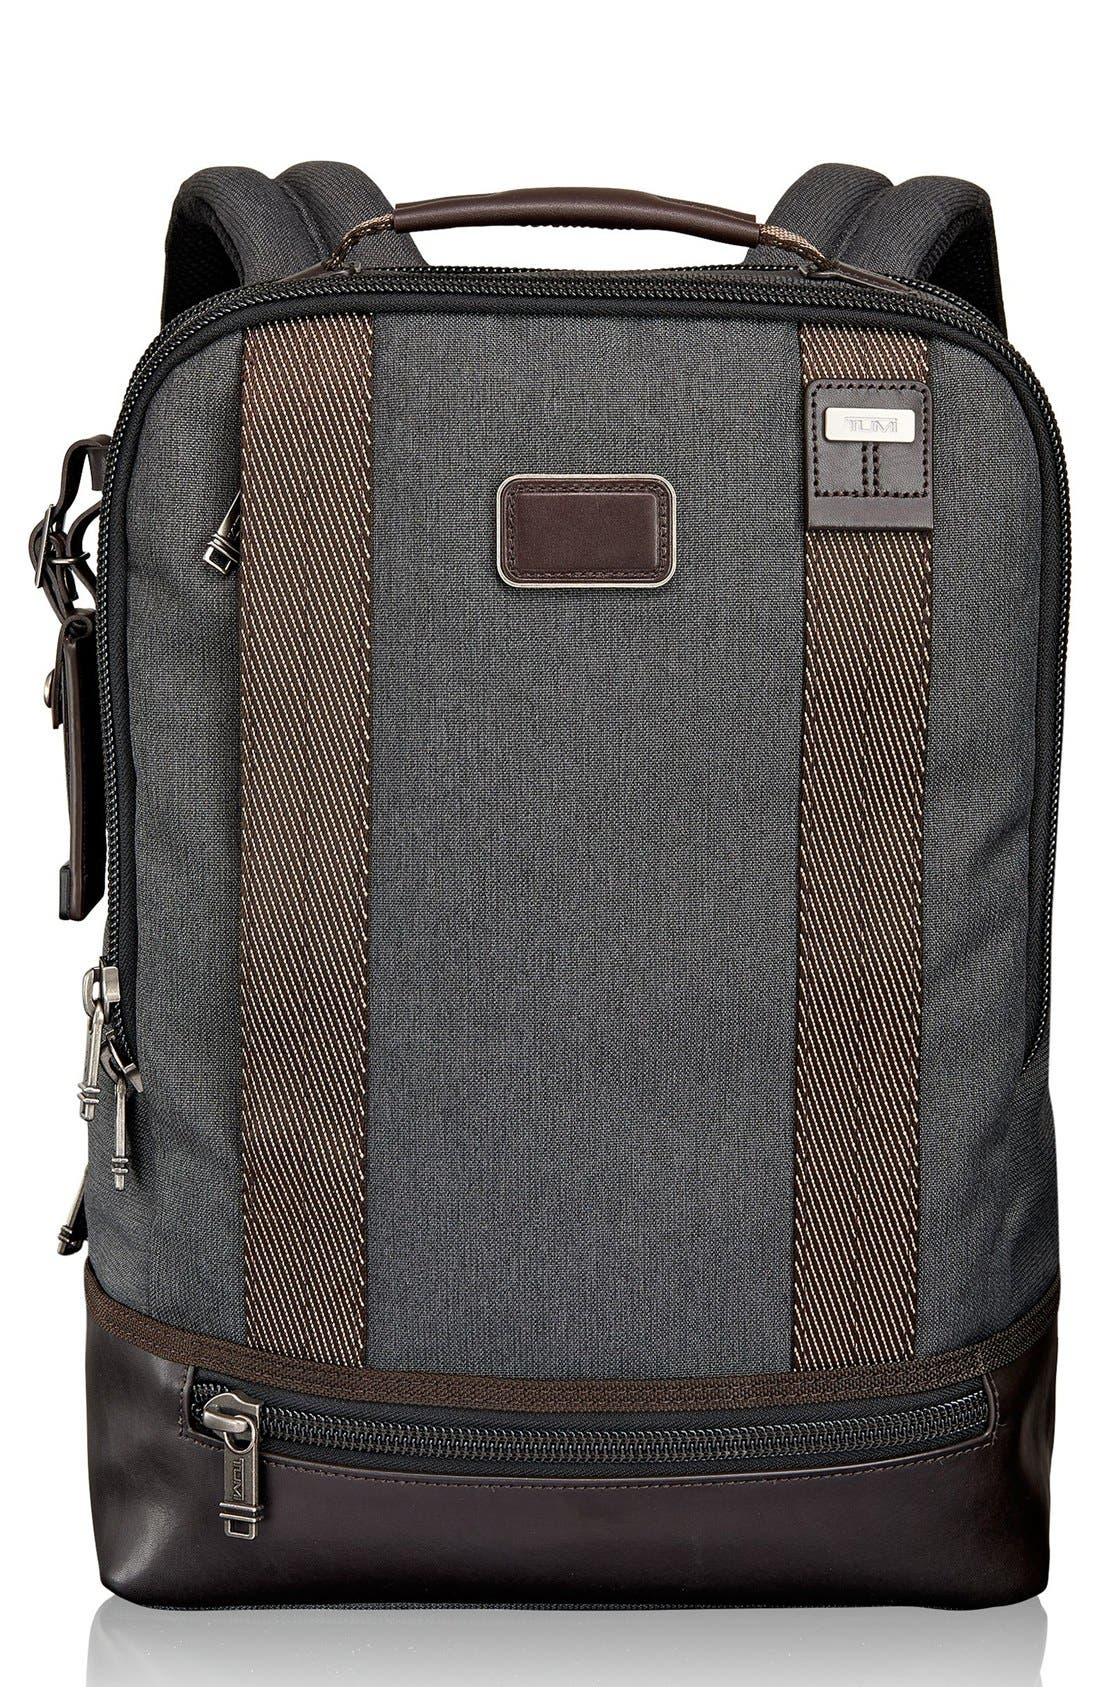 TUMI,                             Alpha Bravo Dover Backpack,                             Main thumbnail 1, color,                             010